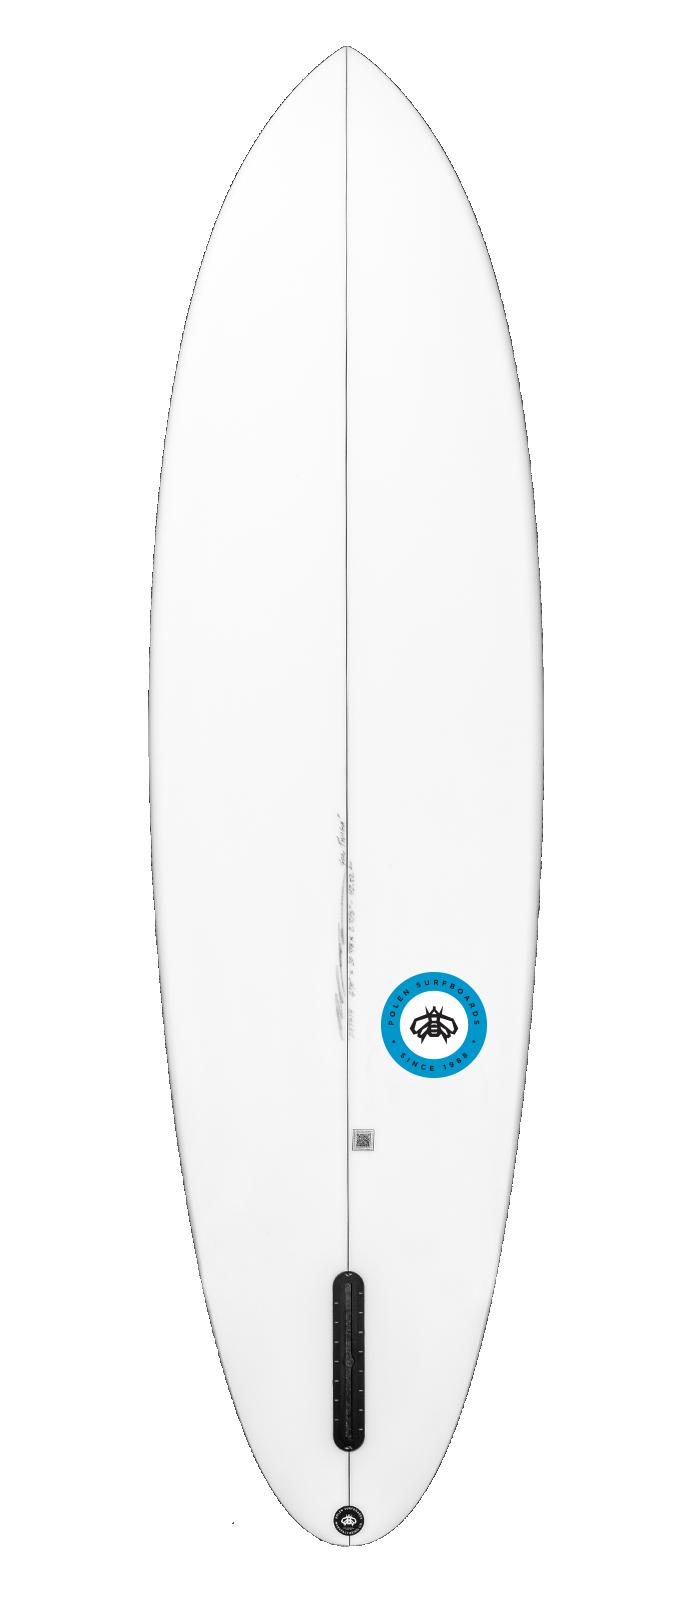 FAST SLICE surfboard model bottom